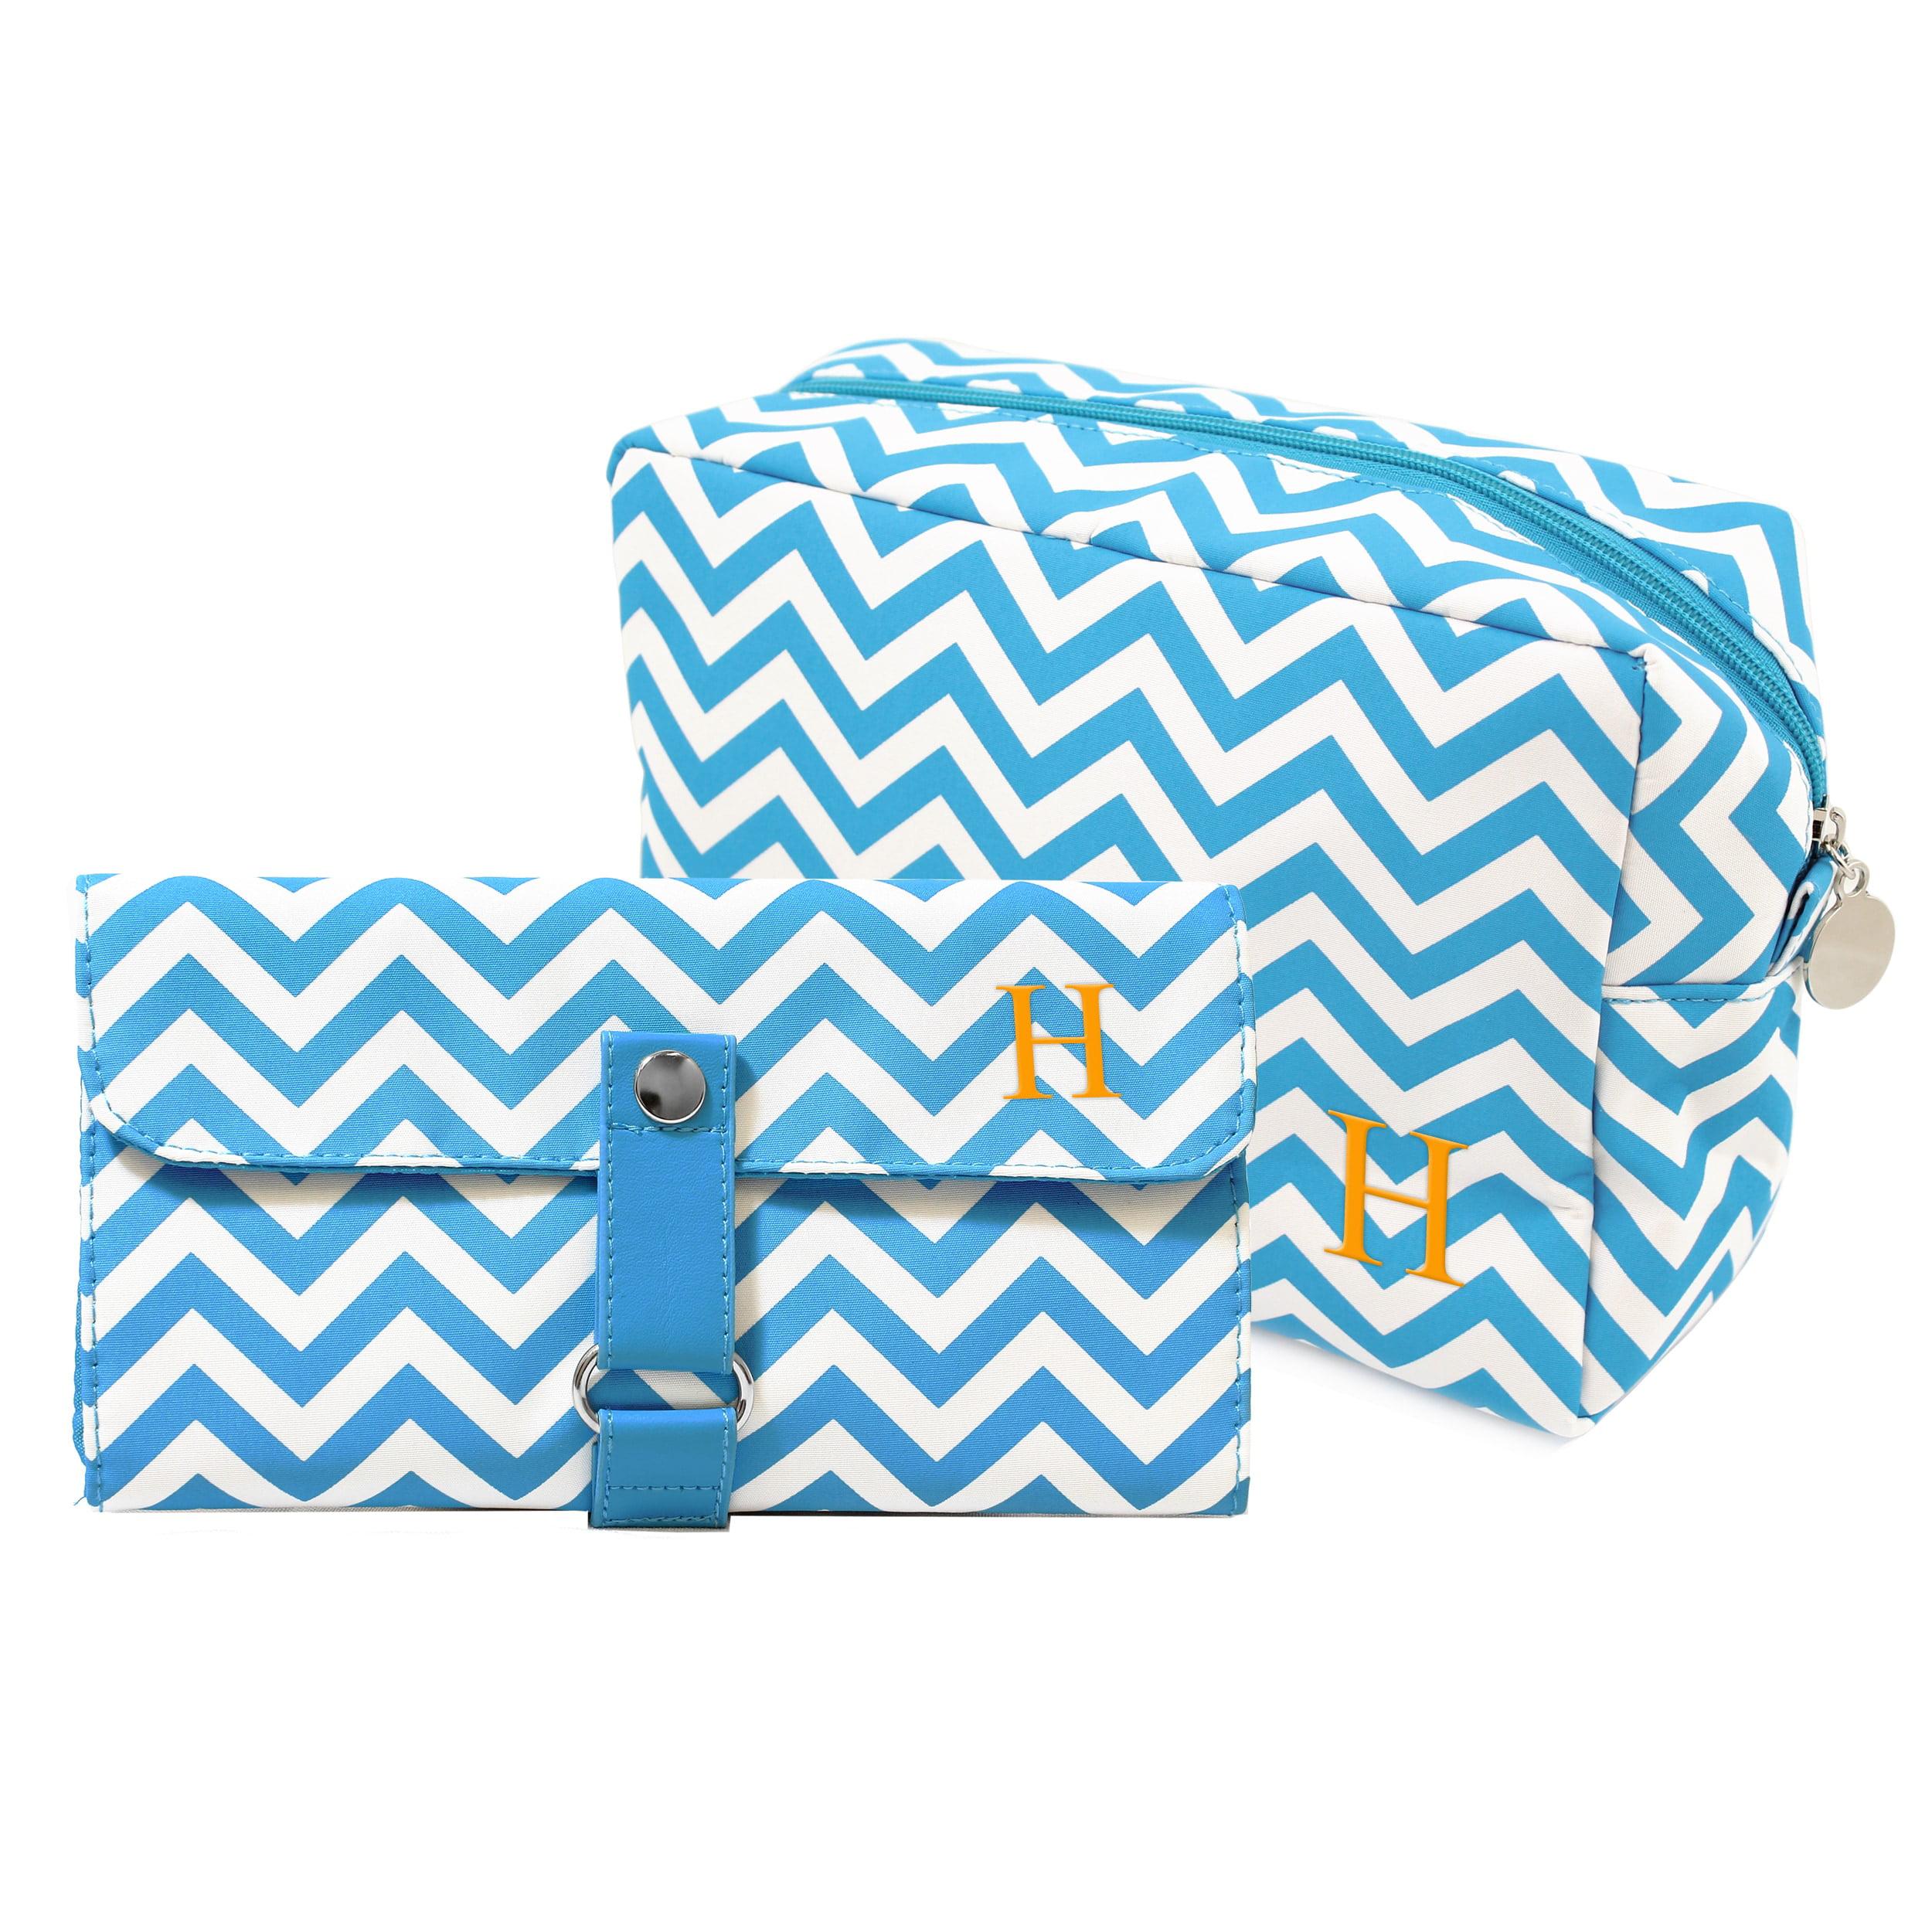 Personalized Aqua Spa Bag & Makeup Roll Brush Set Personalized Aqua Chevron 6-piece Spa Bag and Makeup Roll Brush Set